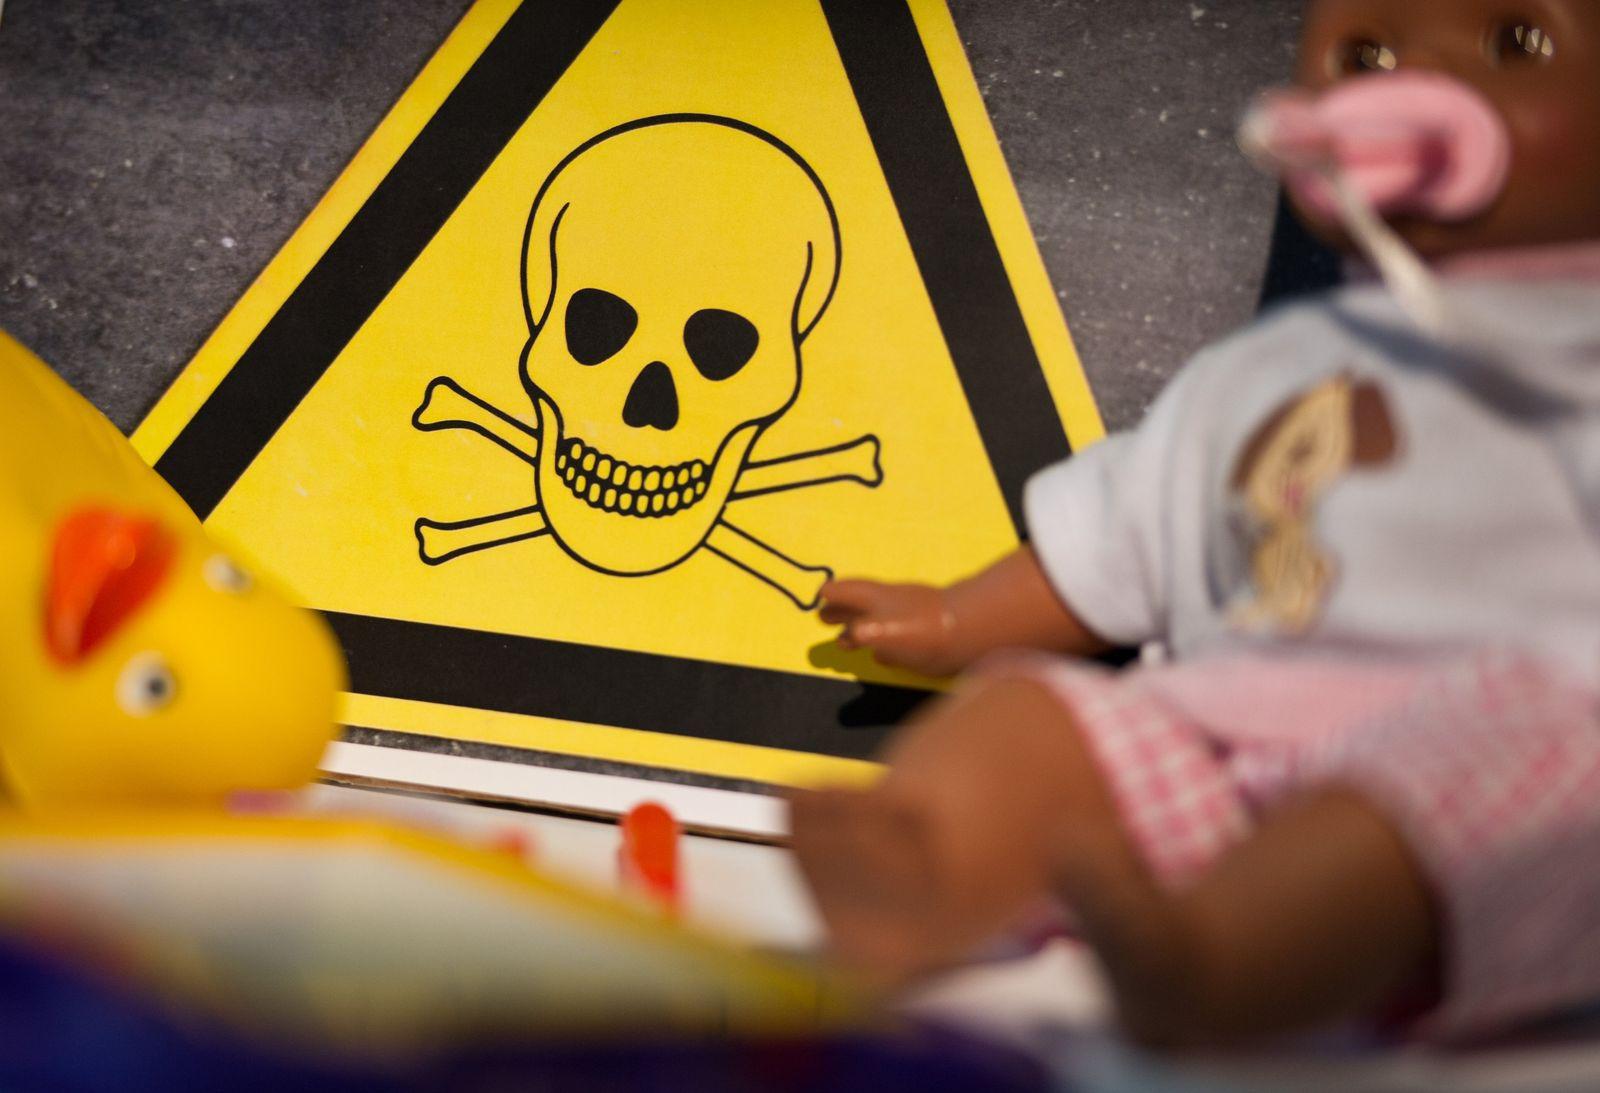 Spielzeug / Schwermetall / giftig